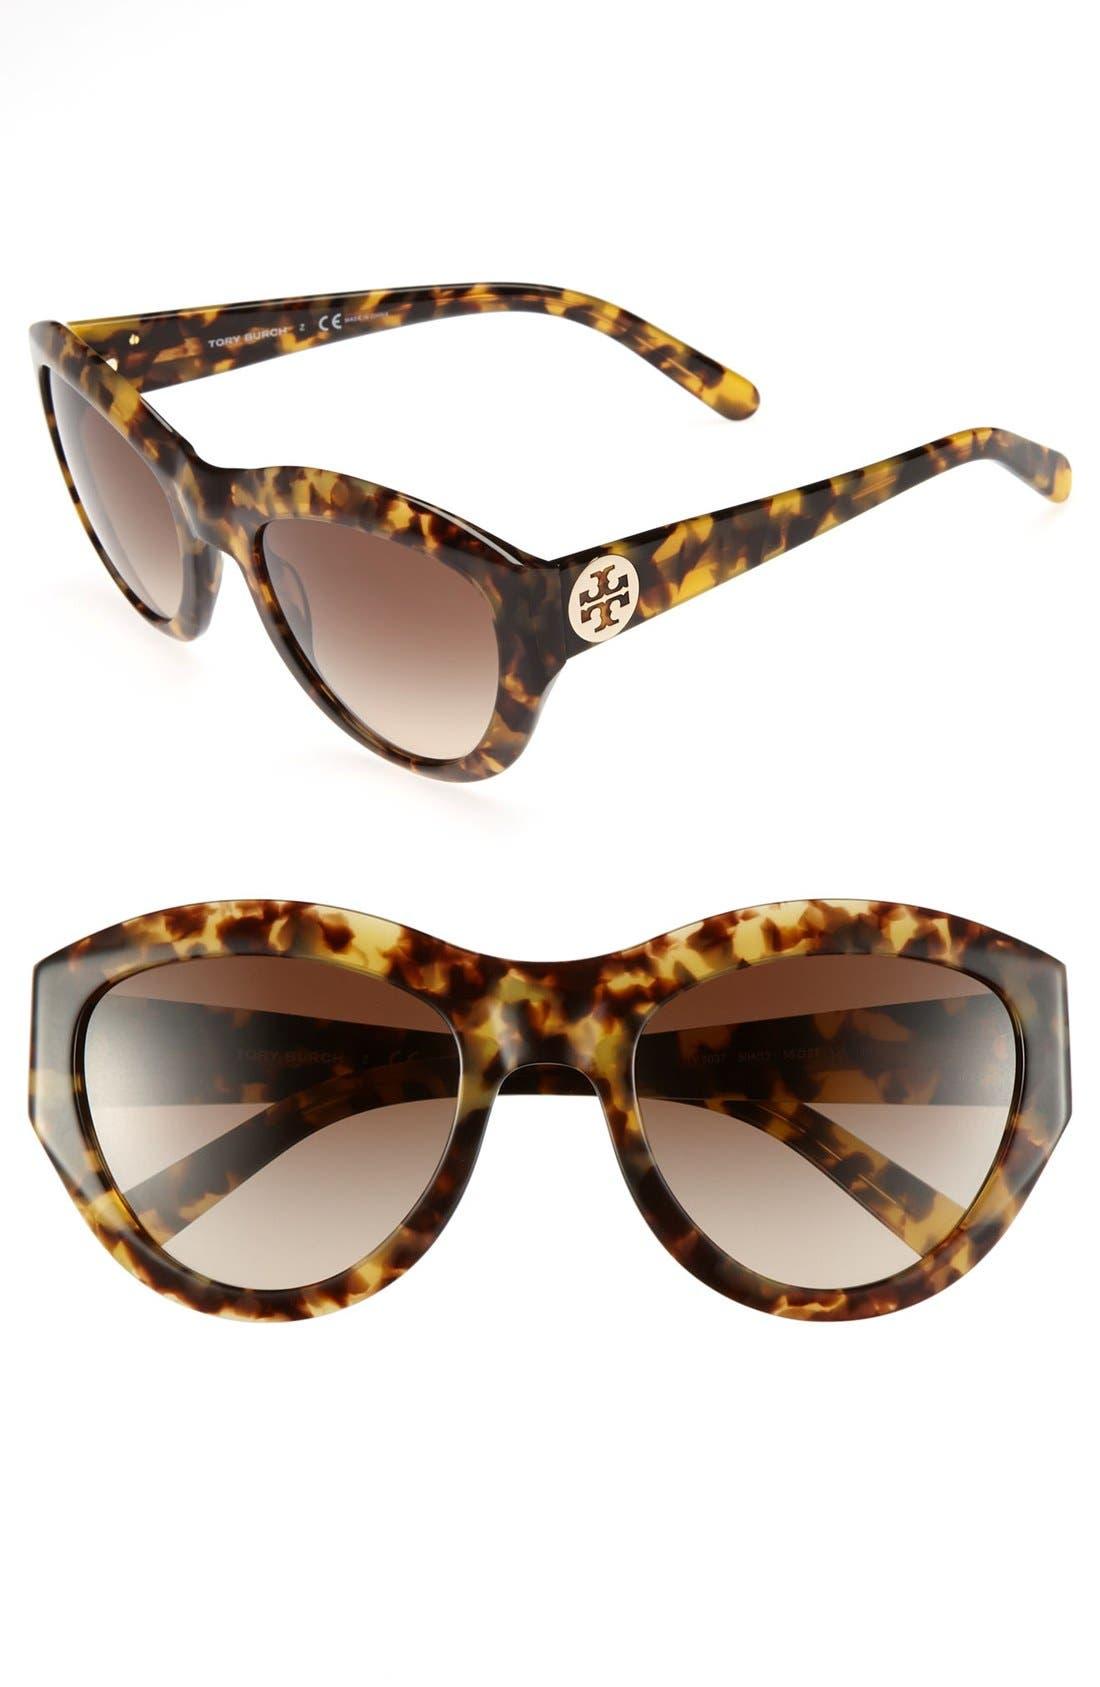 Main Image - Tory Burch 55mm Retro Sunglasses